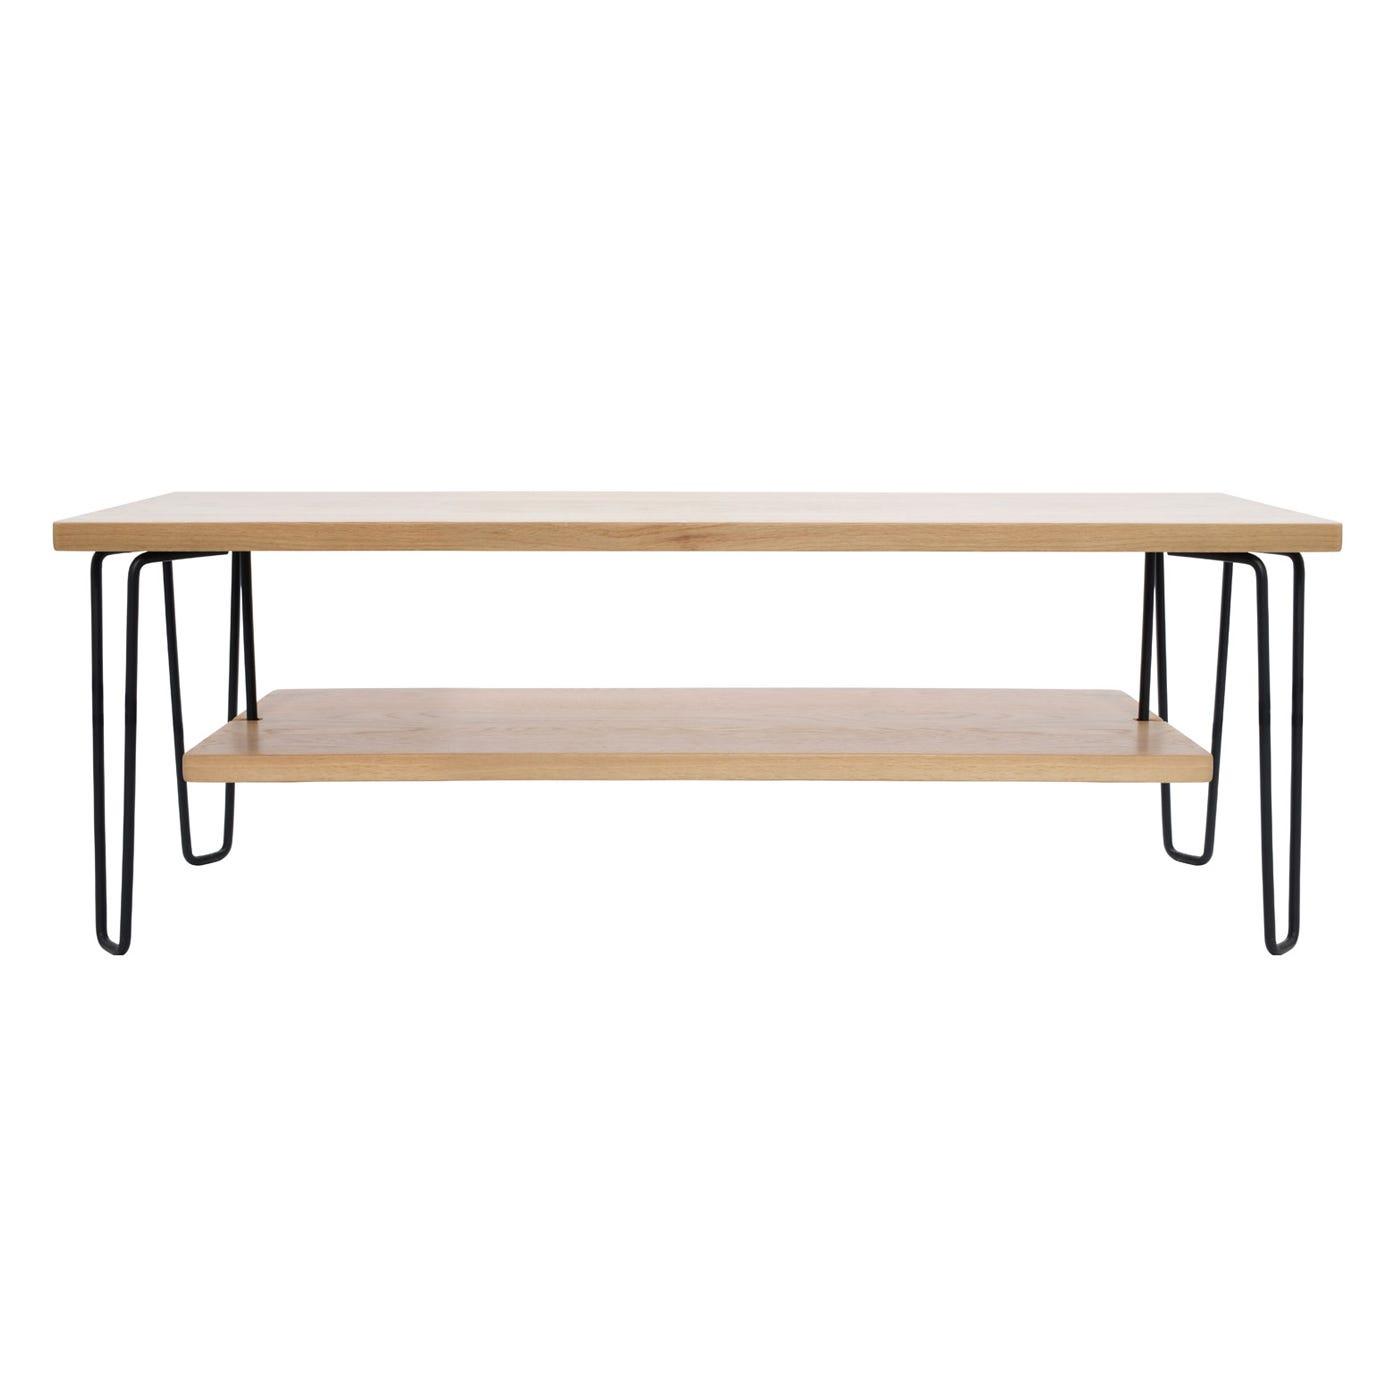 Brunel Shelf For Bench/ Hallway Bench